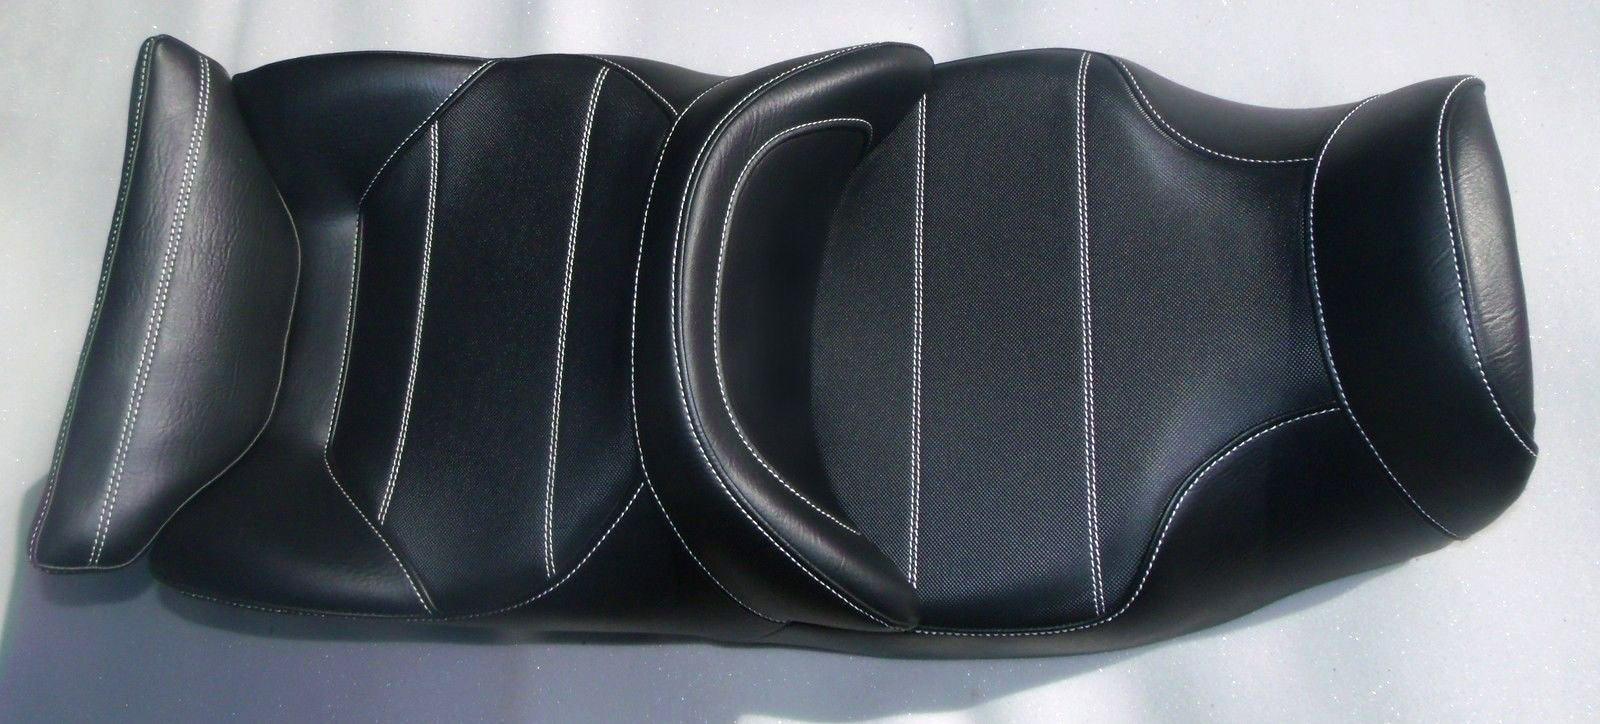 Sitzbankbezug für Suzuki Burgman 650 Bezug Sitzbezug